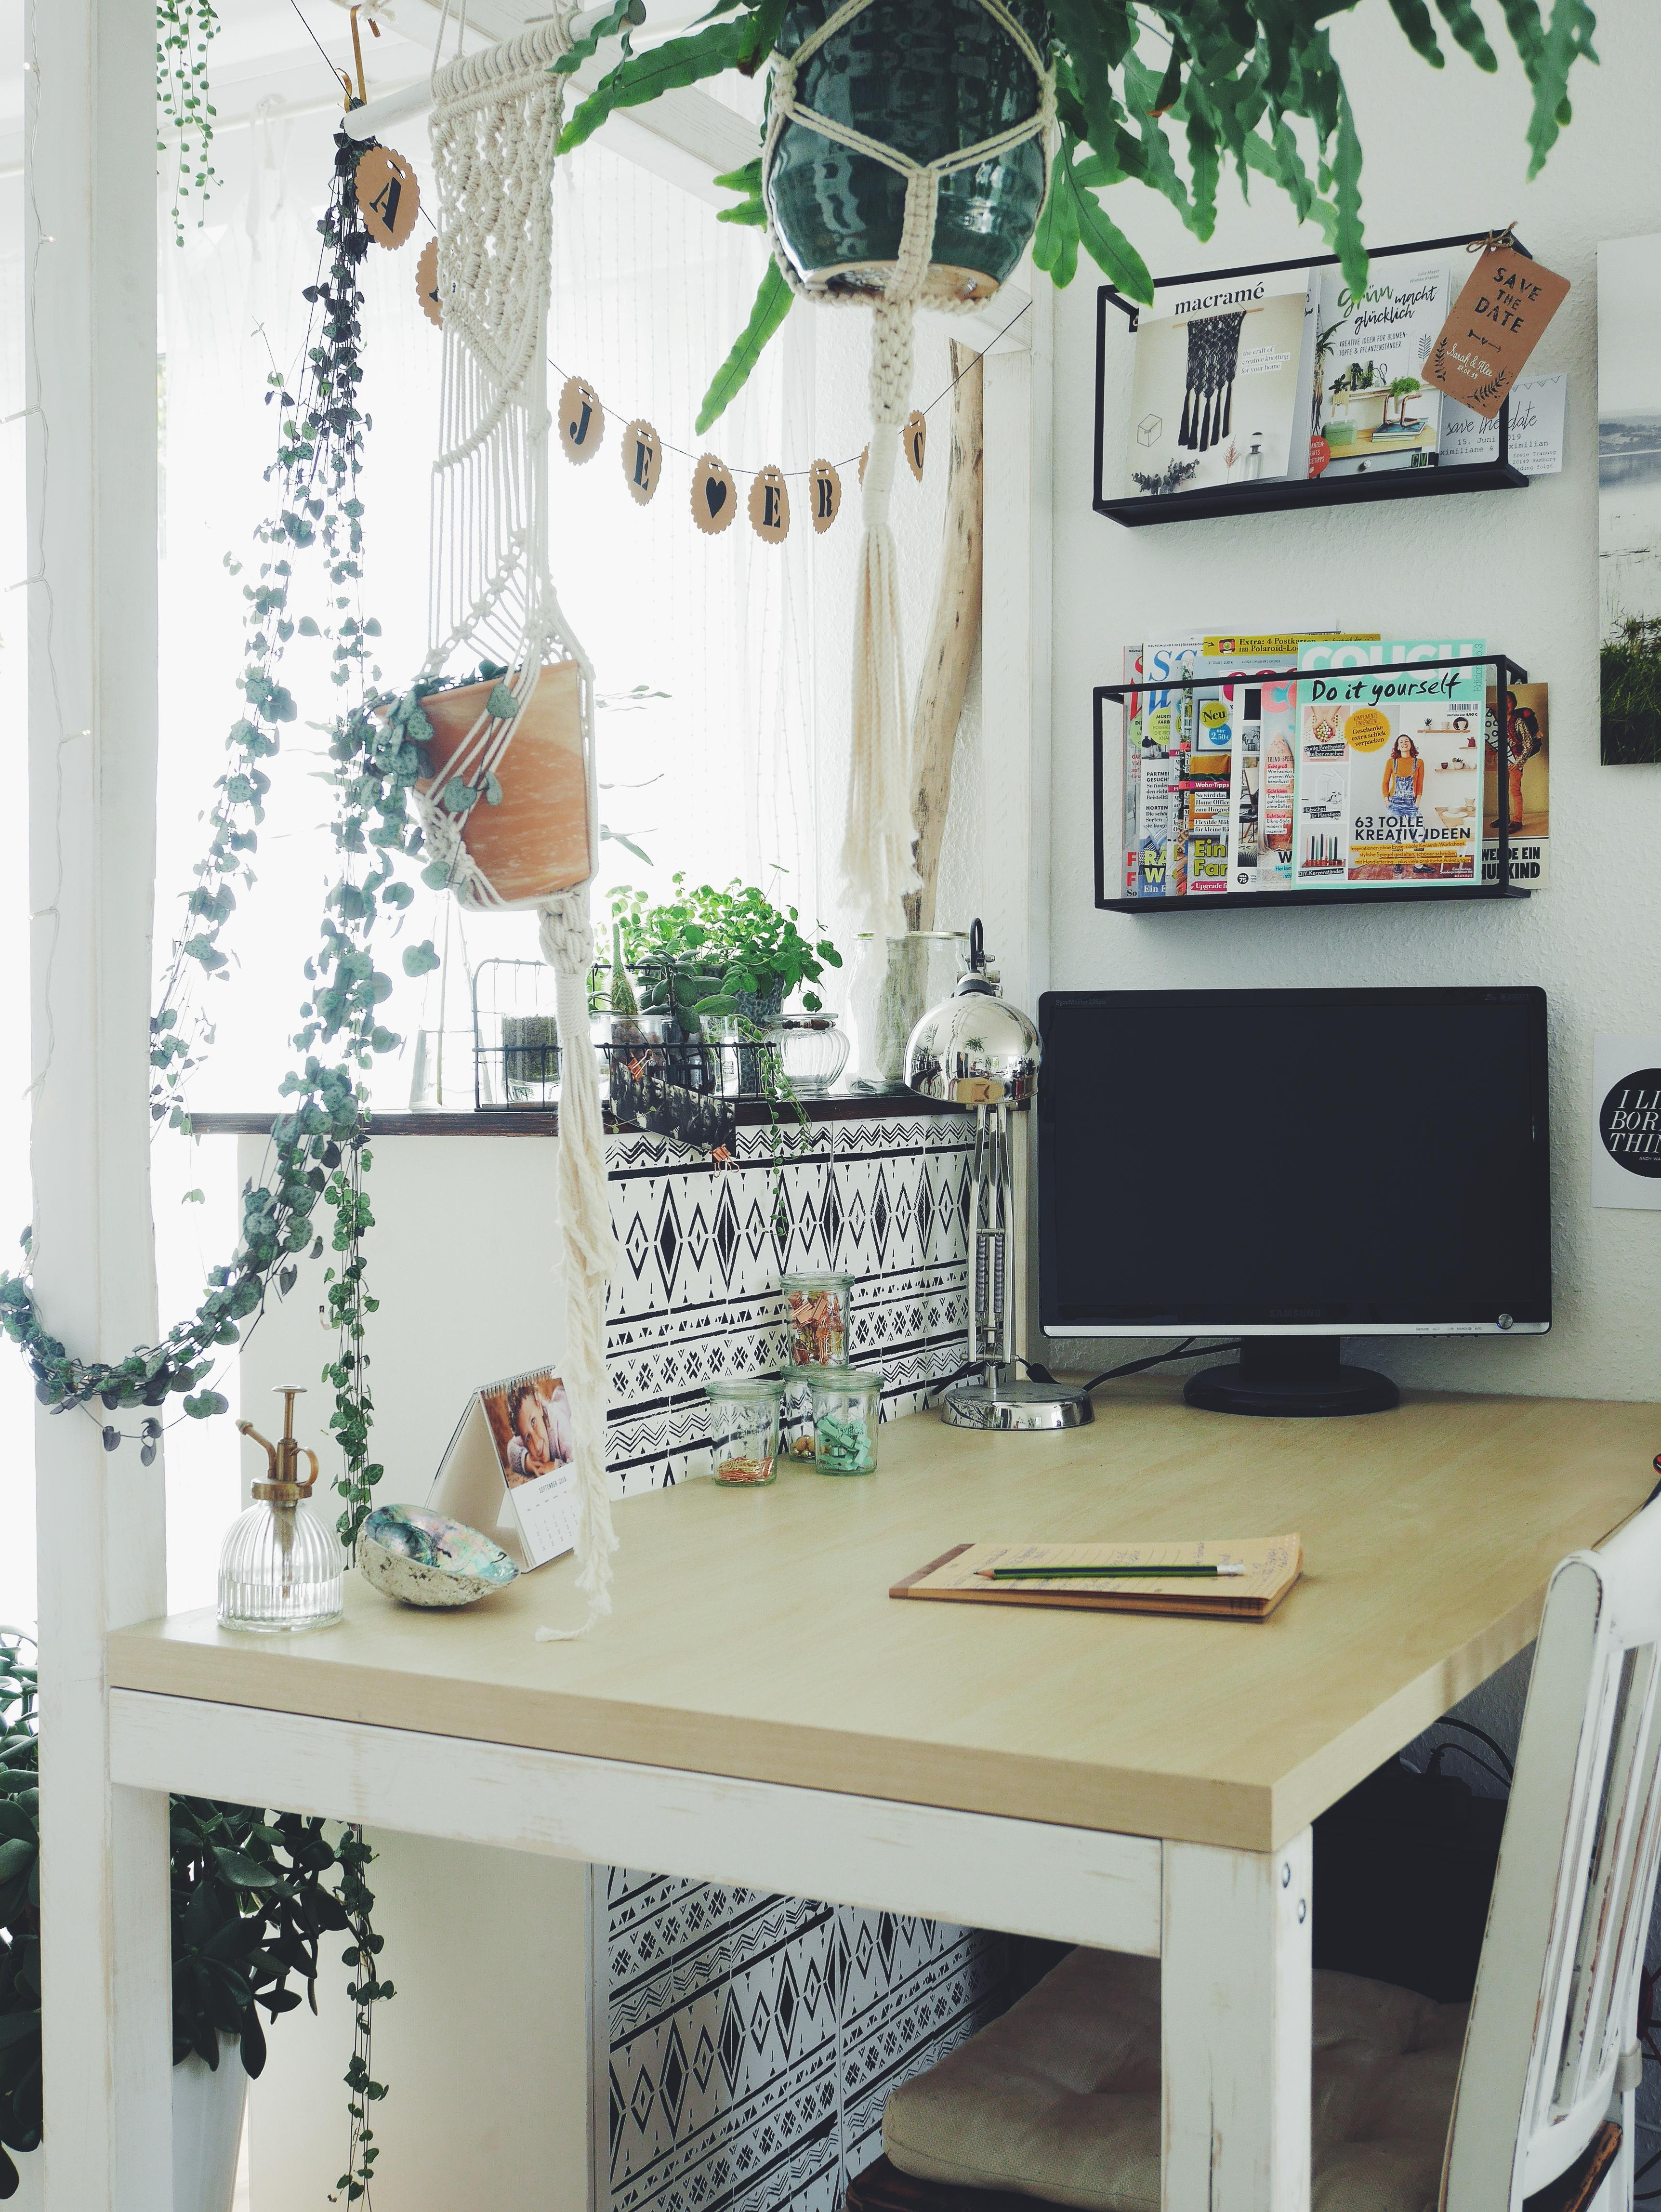 DIY - Do It Yourself: Ideen zum Selbermachen